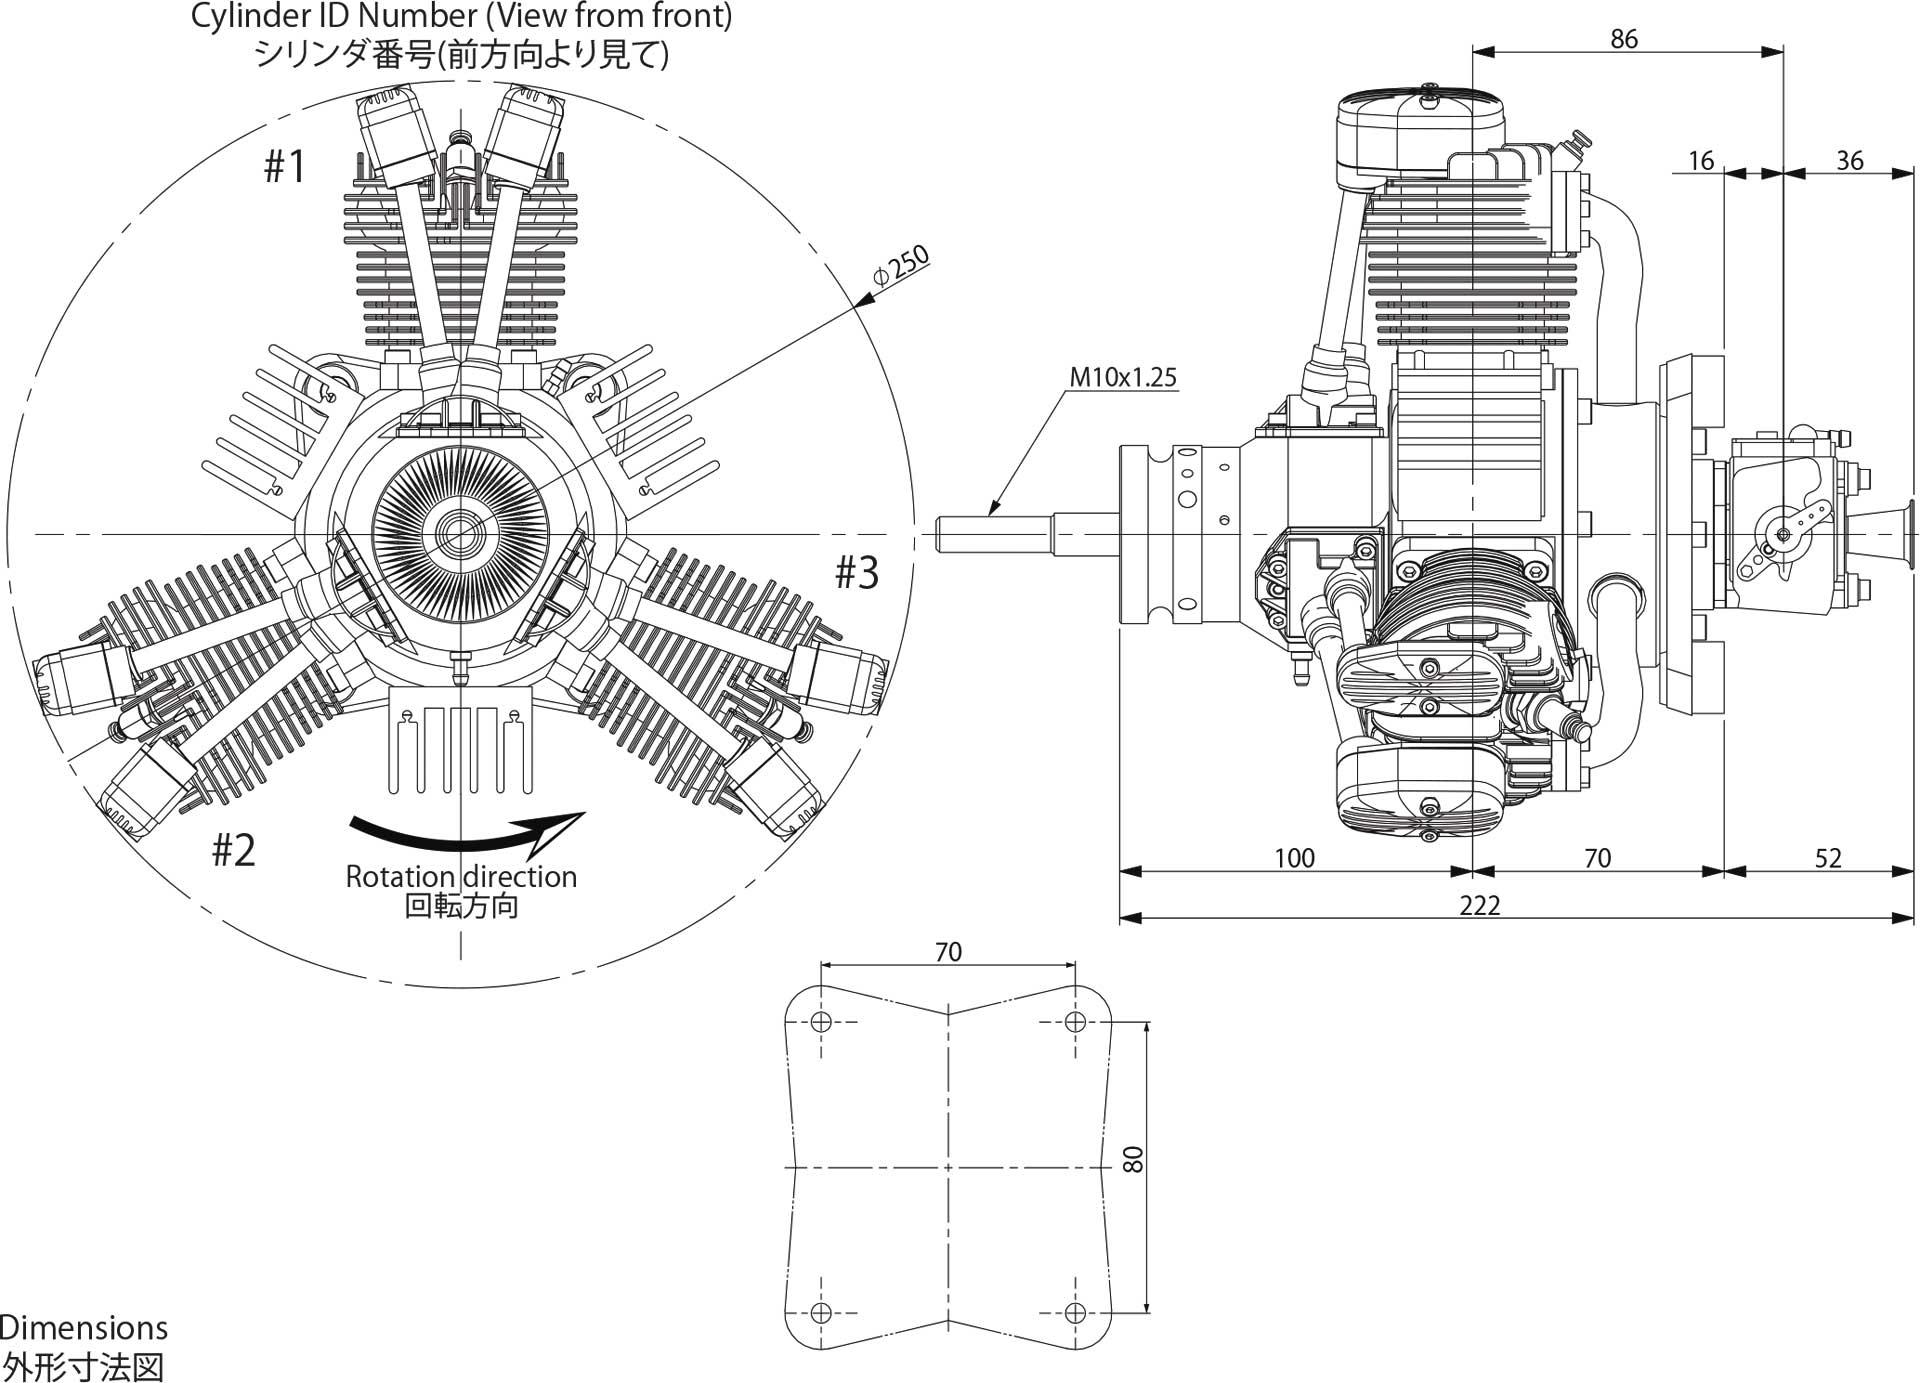 SAITO FG-84R3 BENZIN STERNMOTOR 3-ZYLINDER